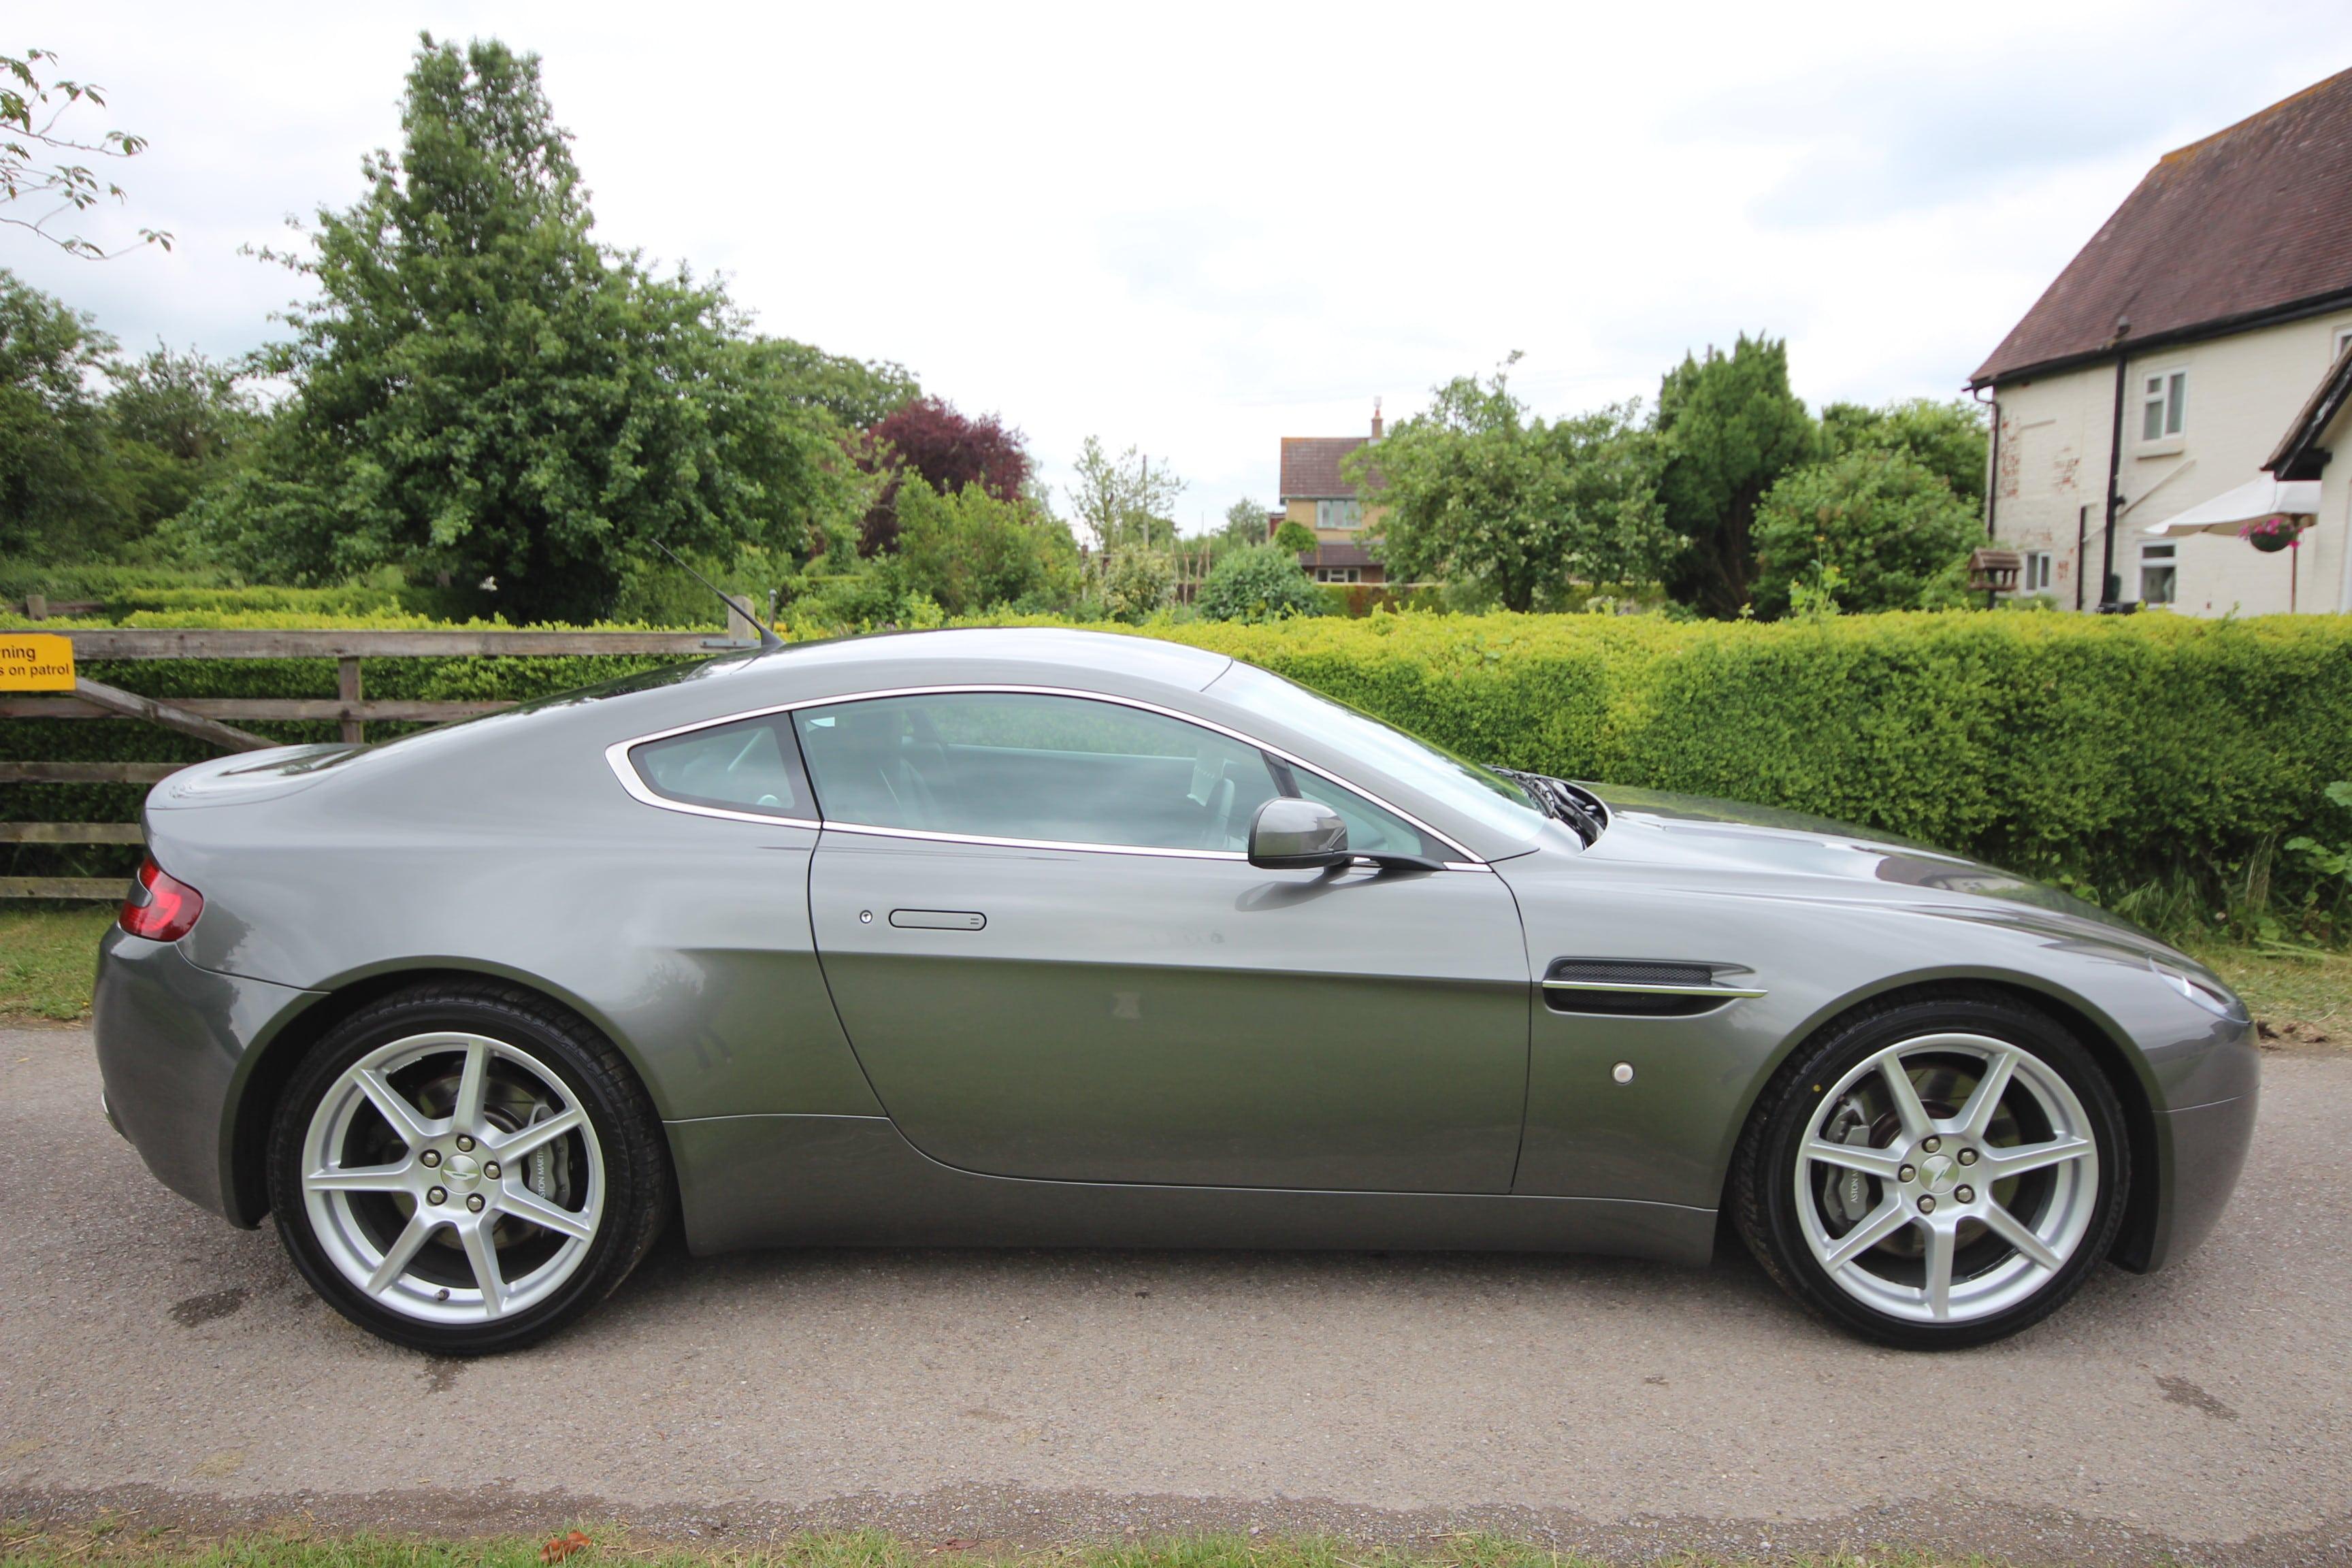 2006 Aston Martin V8 Vantage Pictures